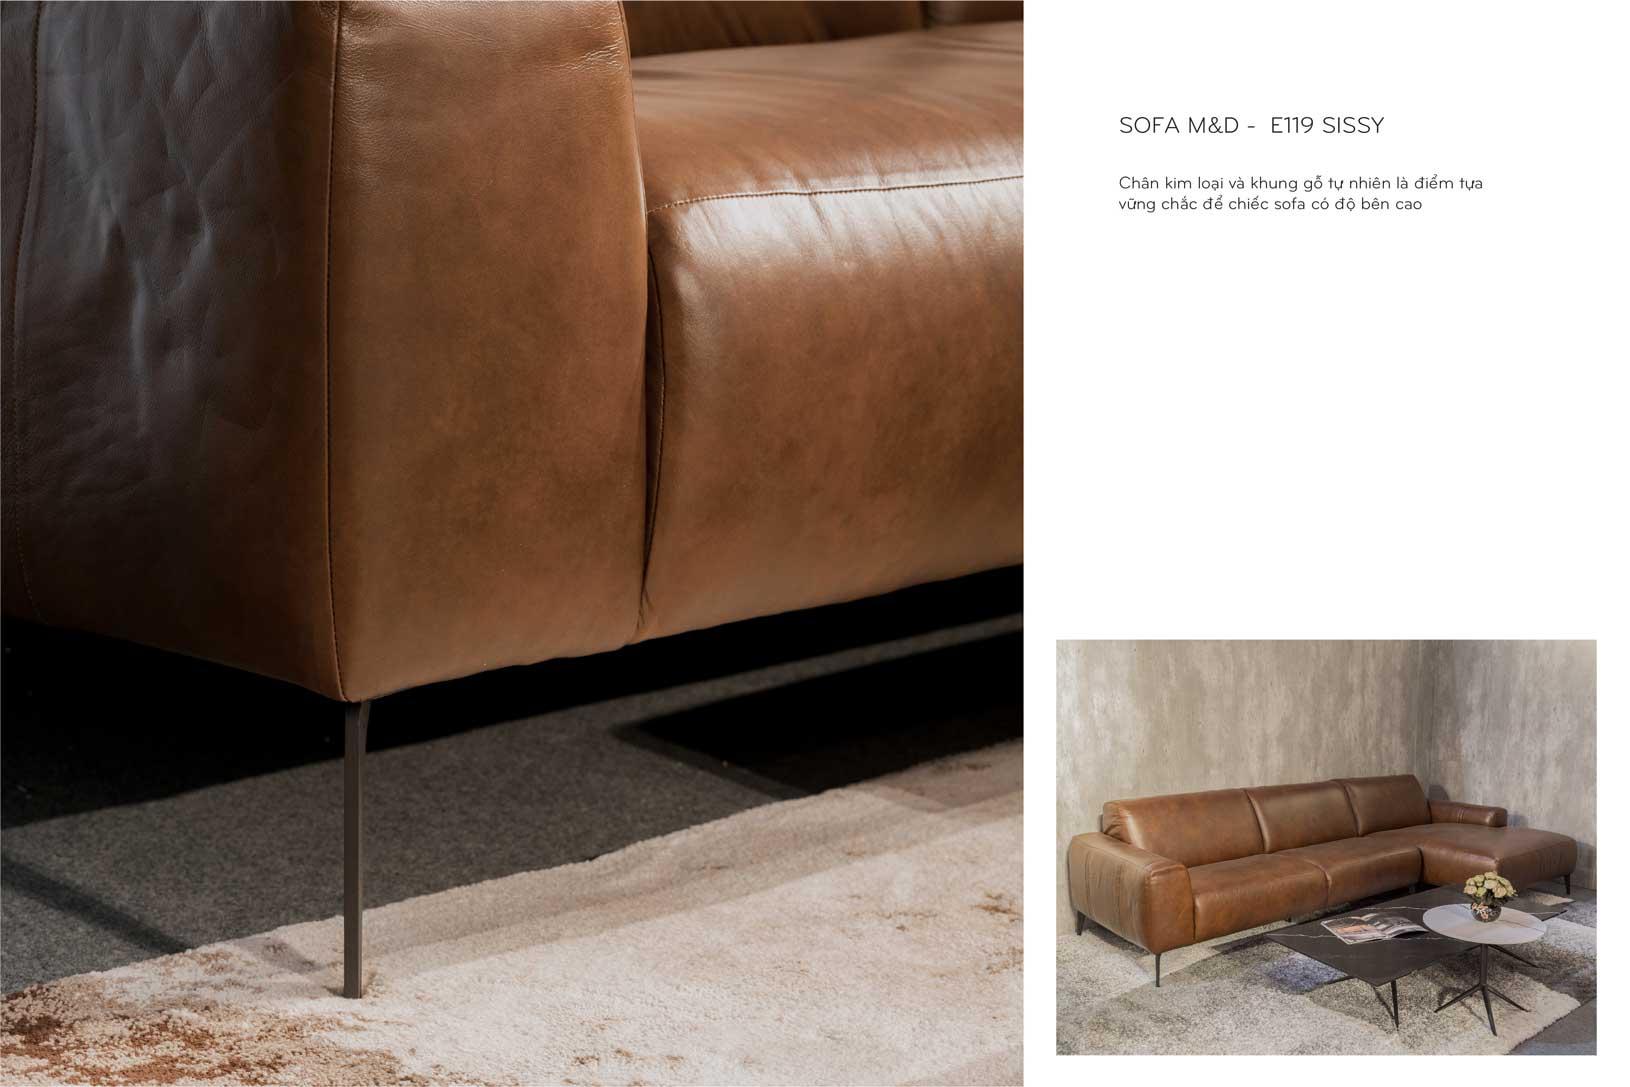 Sofa da thật nhập khẩu E119 có chân ghế thanh mảnh